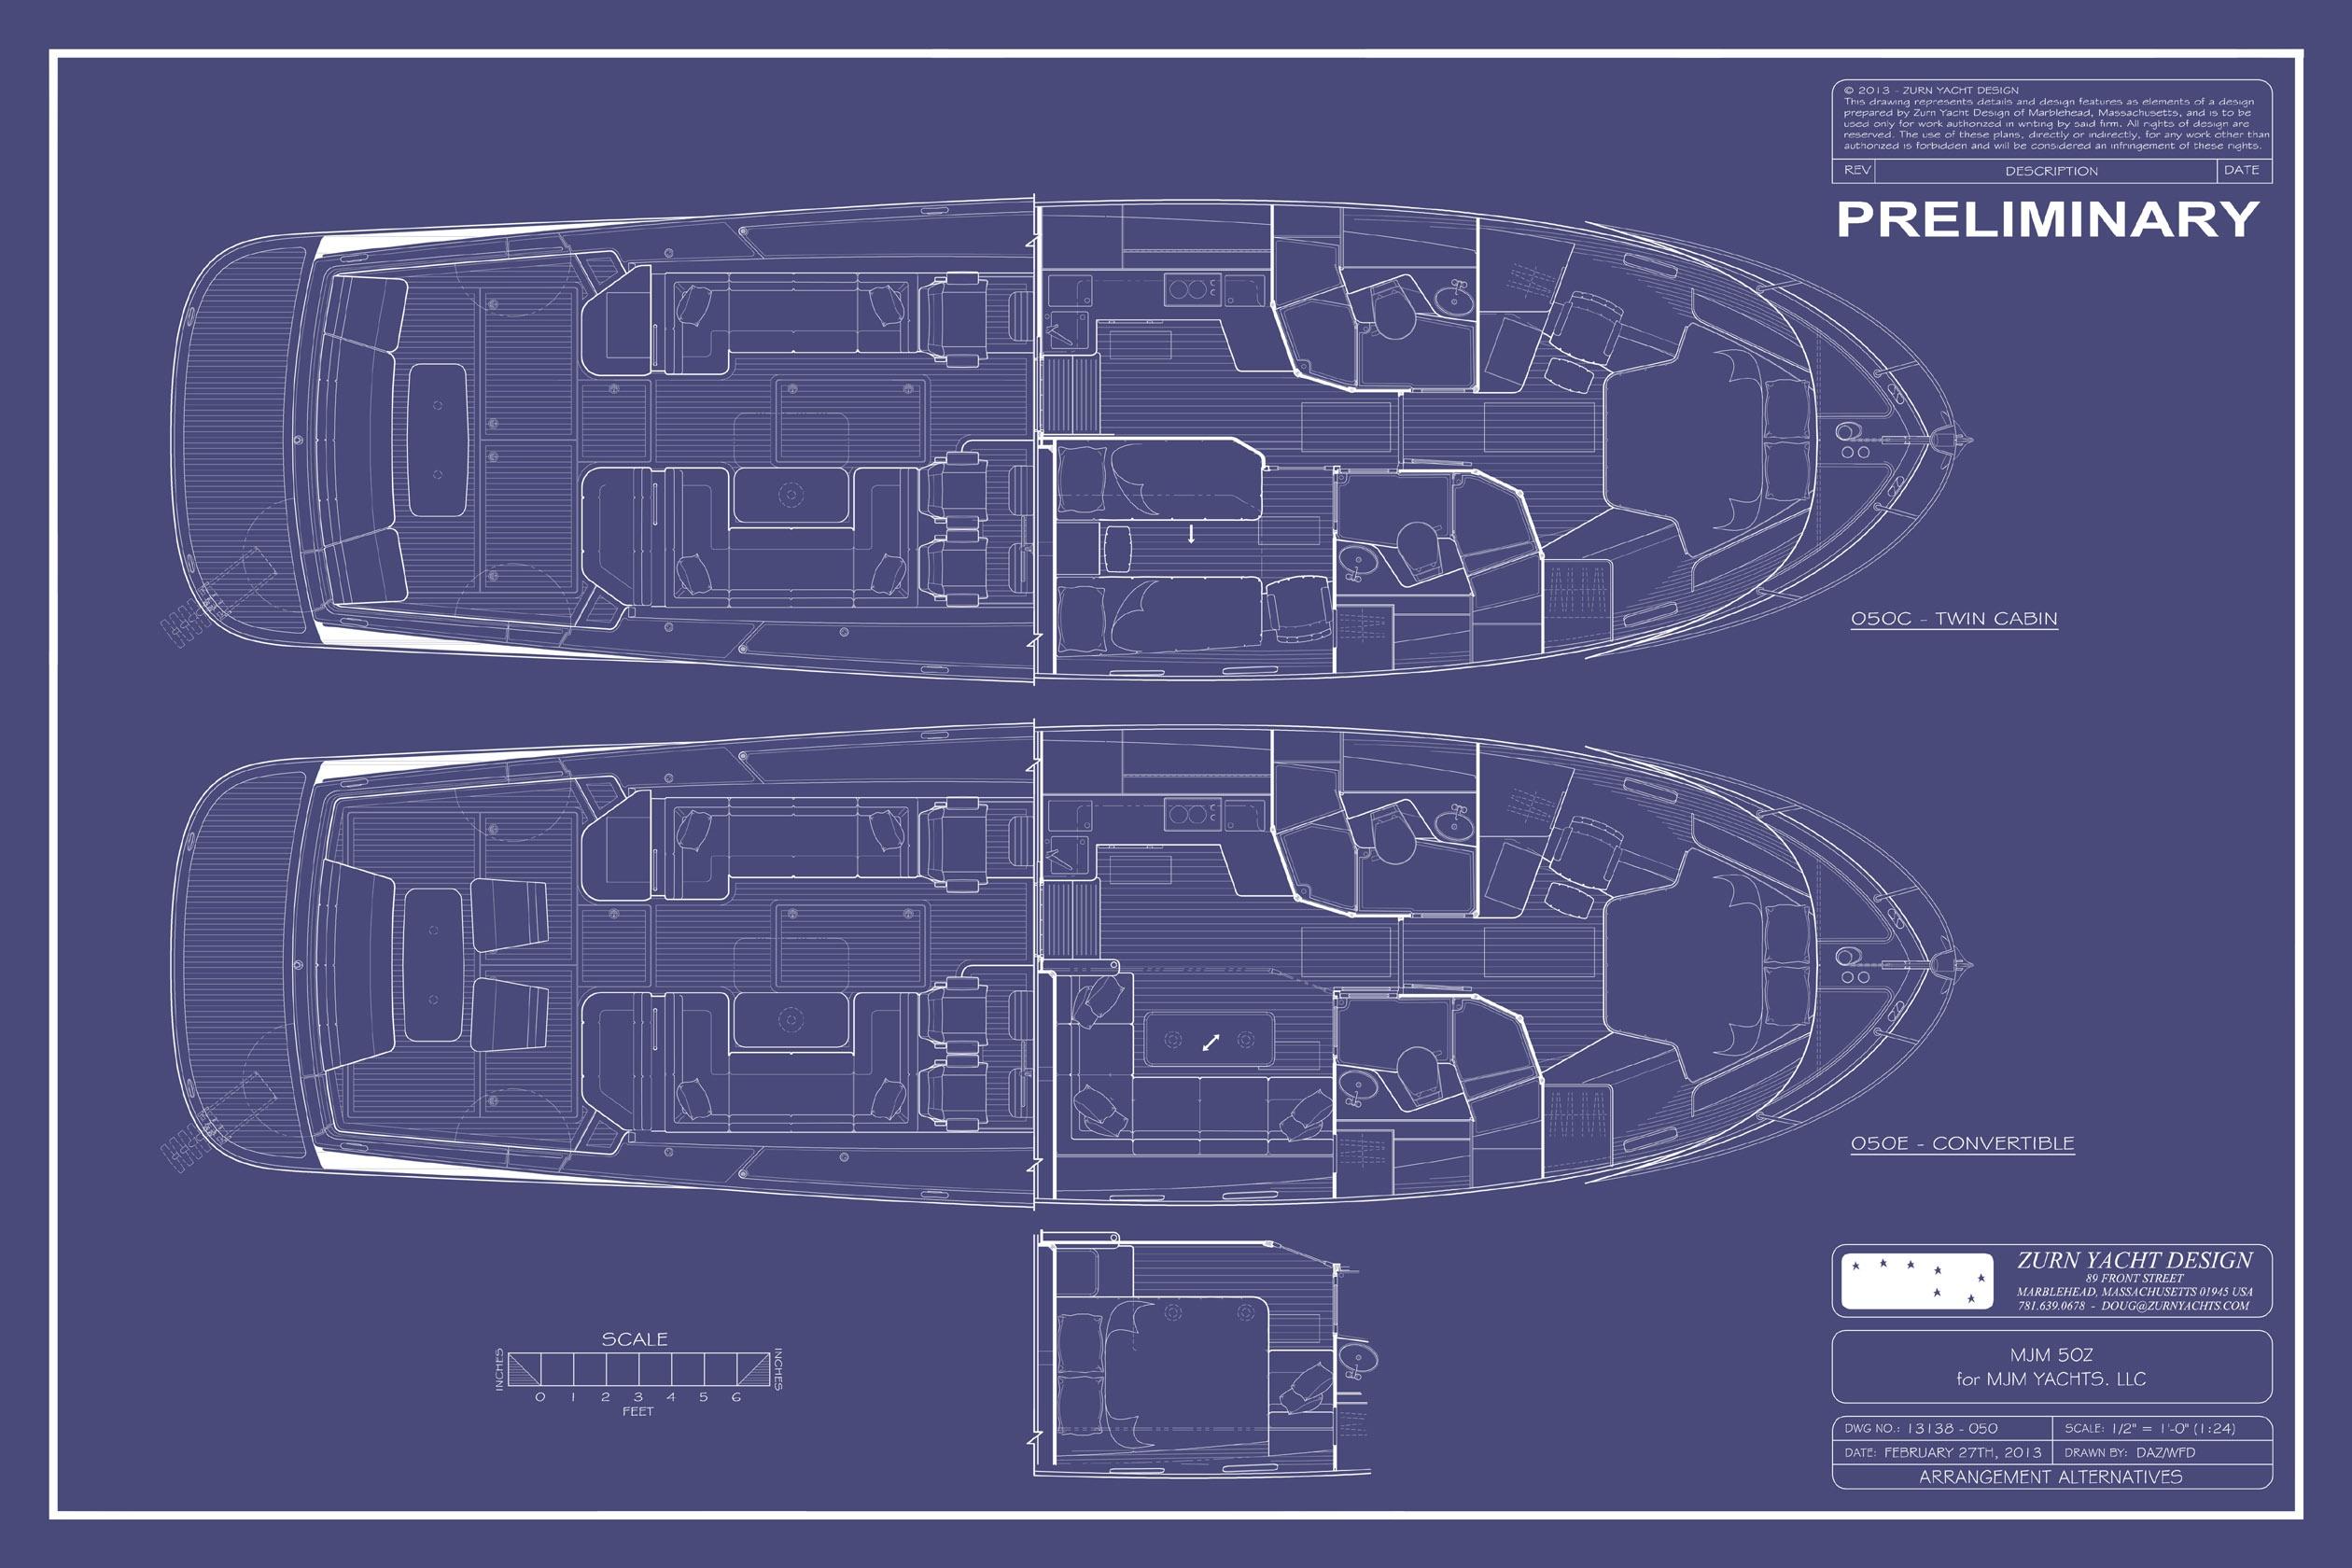 MJM 50Z   Zurn Yacht Design